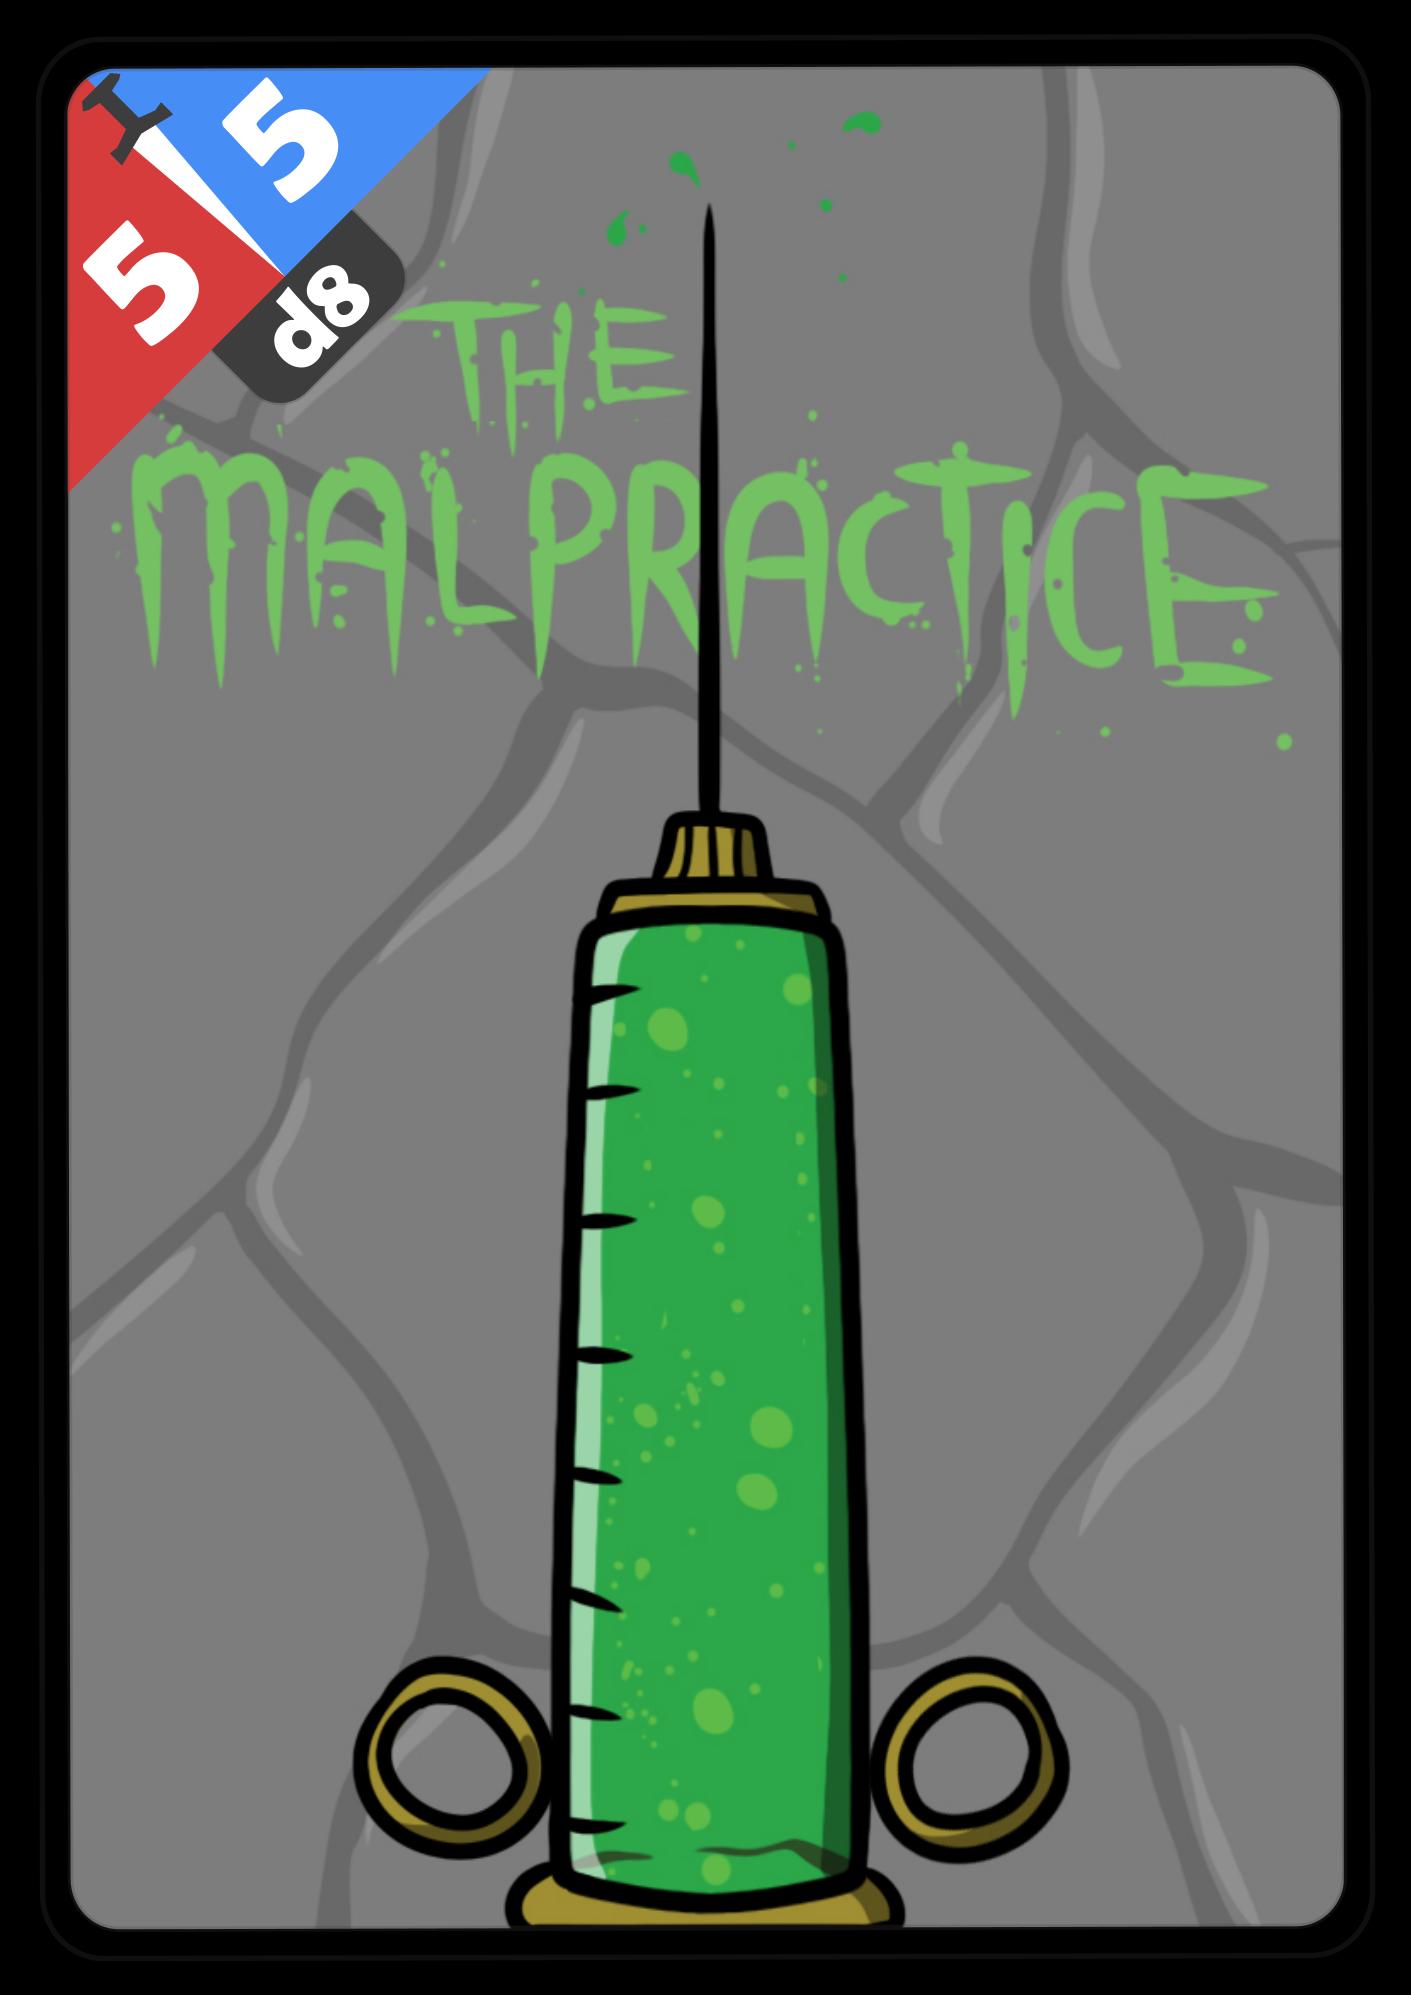 The Malpractice